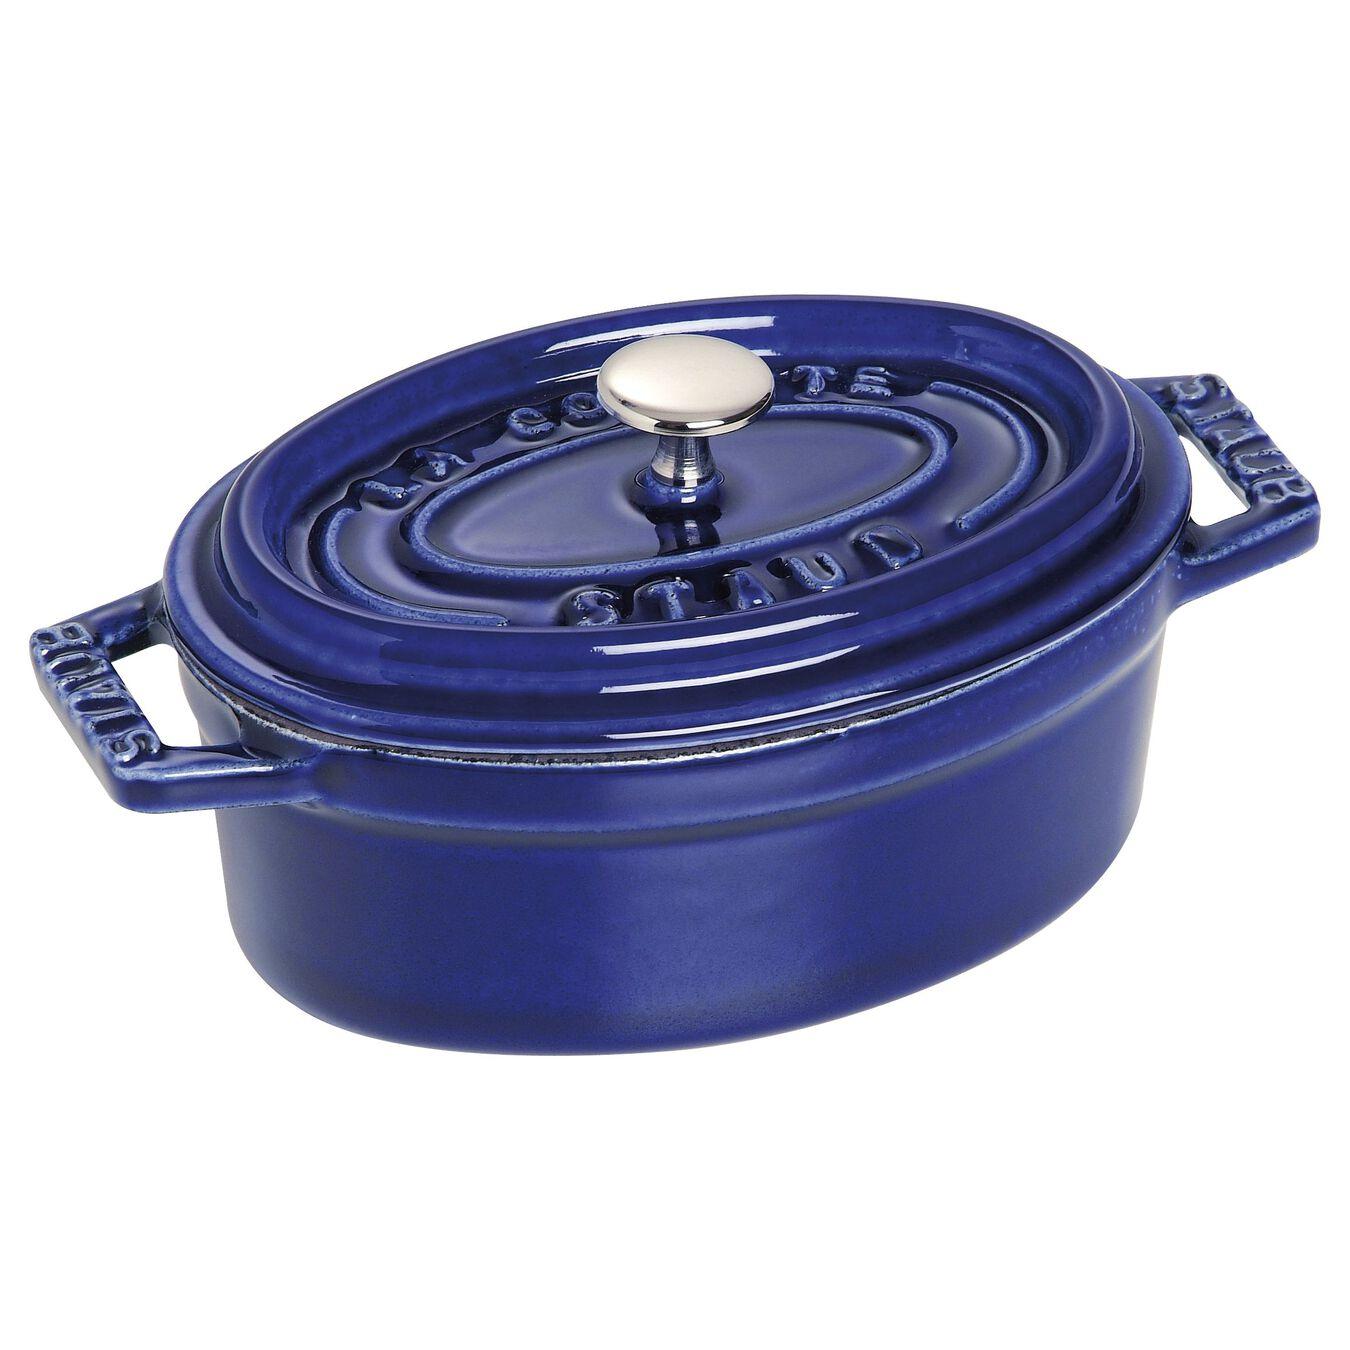 Mini Cocotte 11 cm, Ovale, Bleu intense, Fonte,,large 2